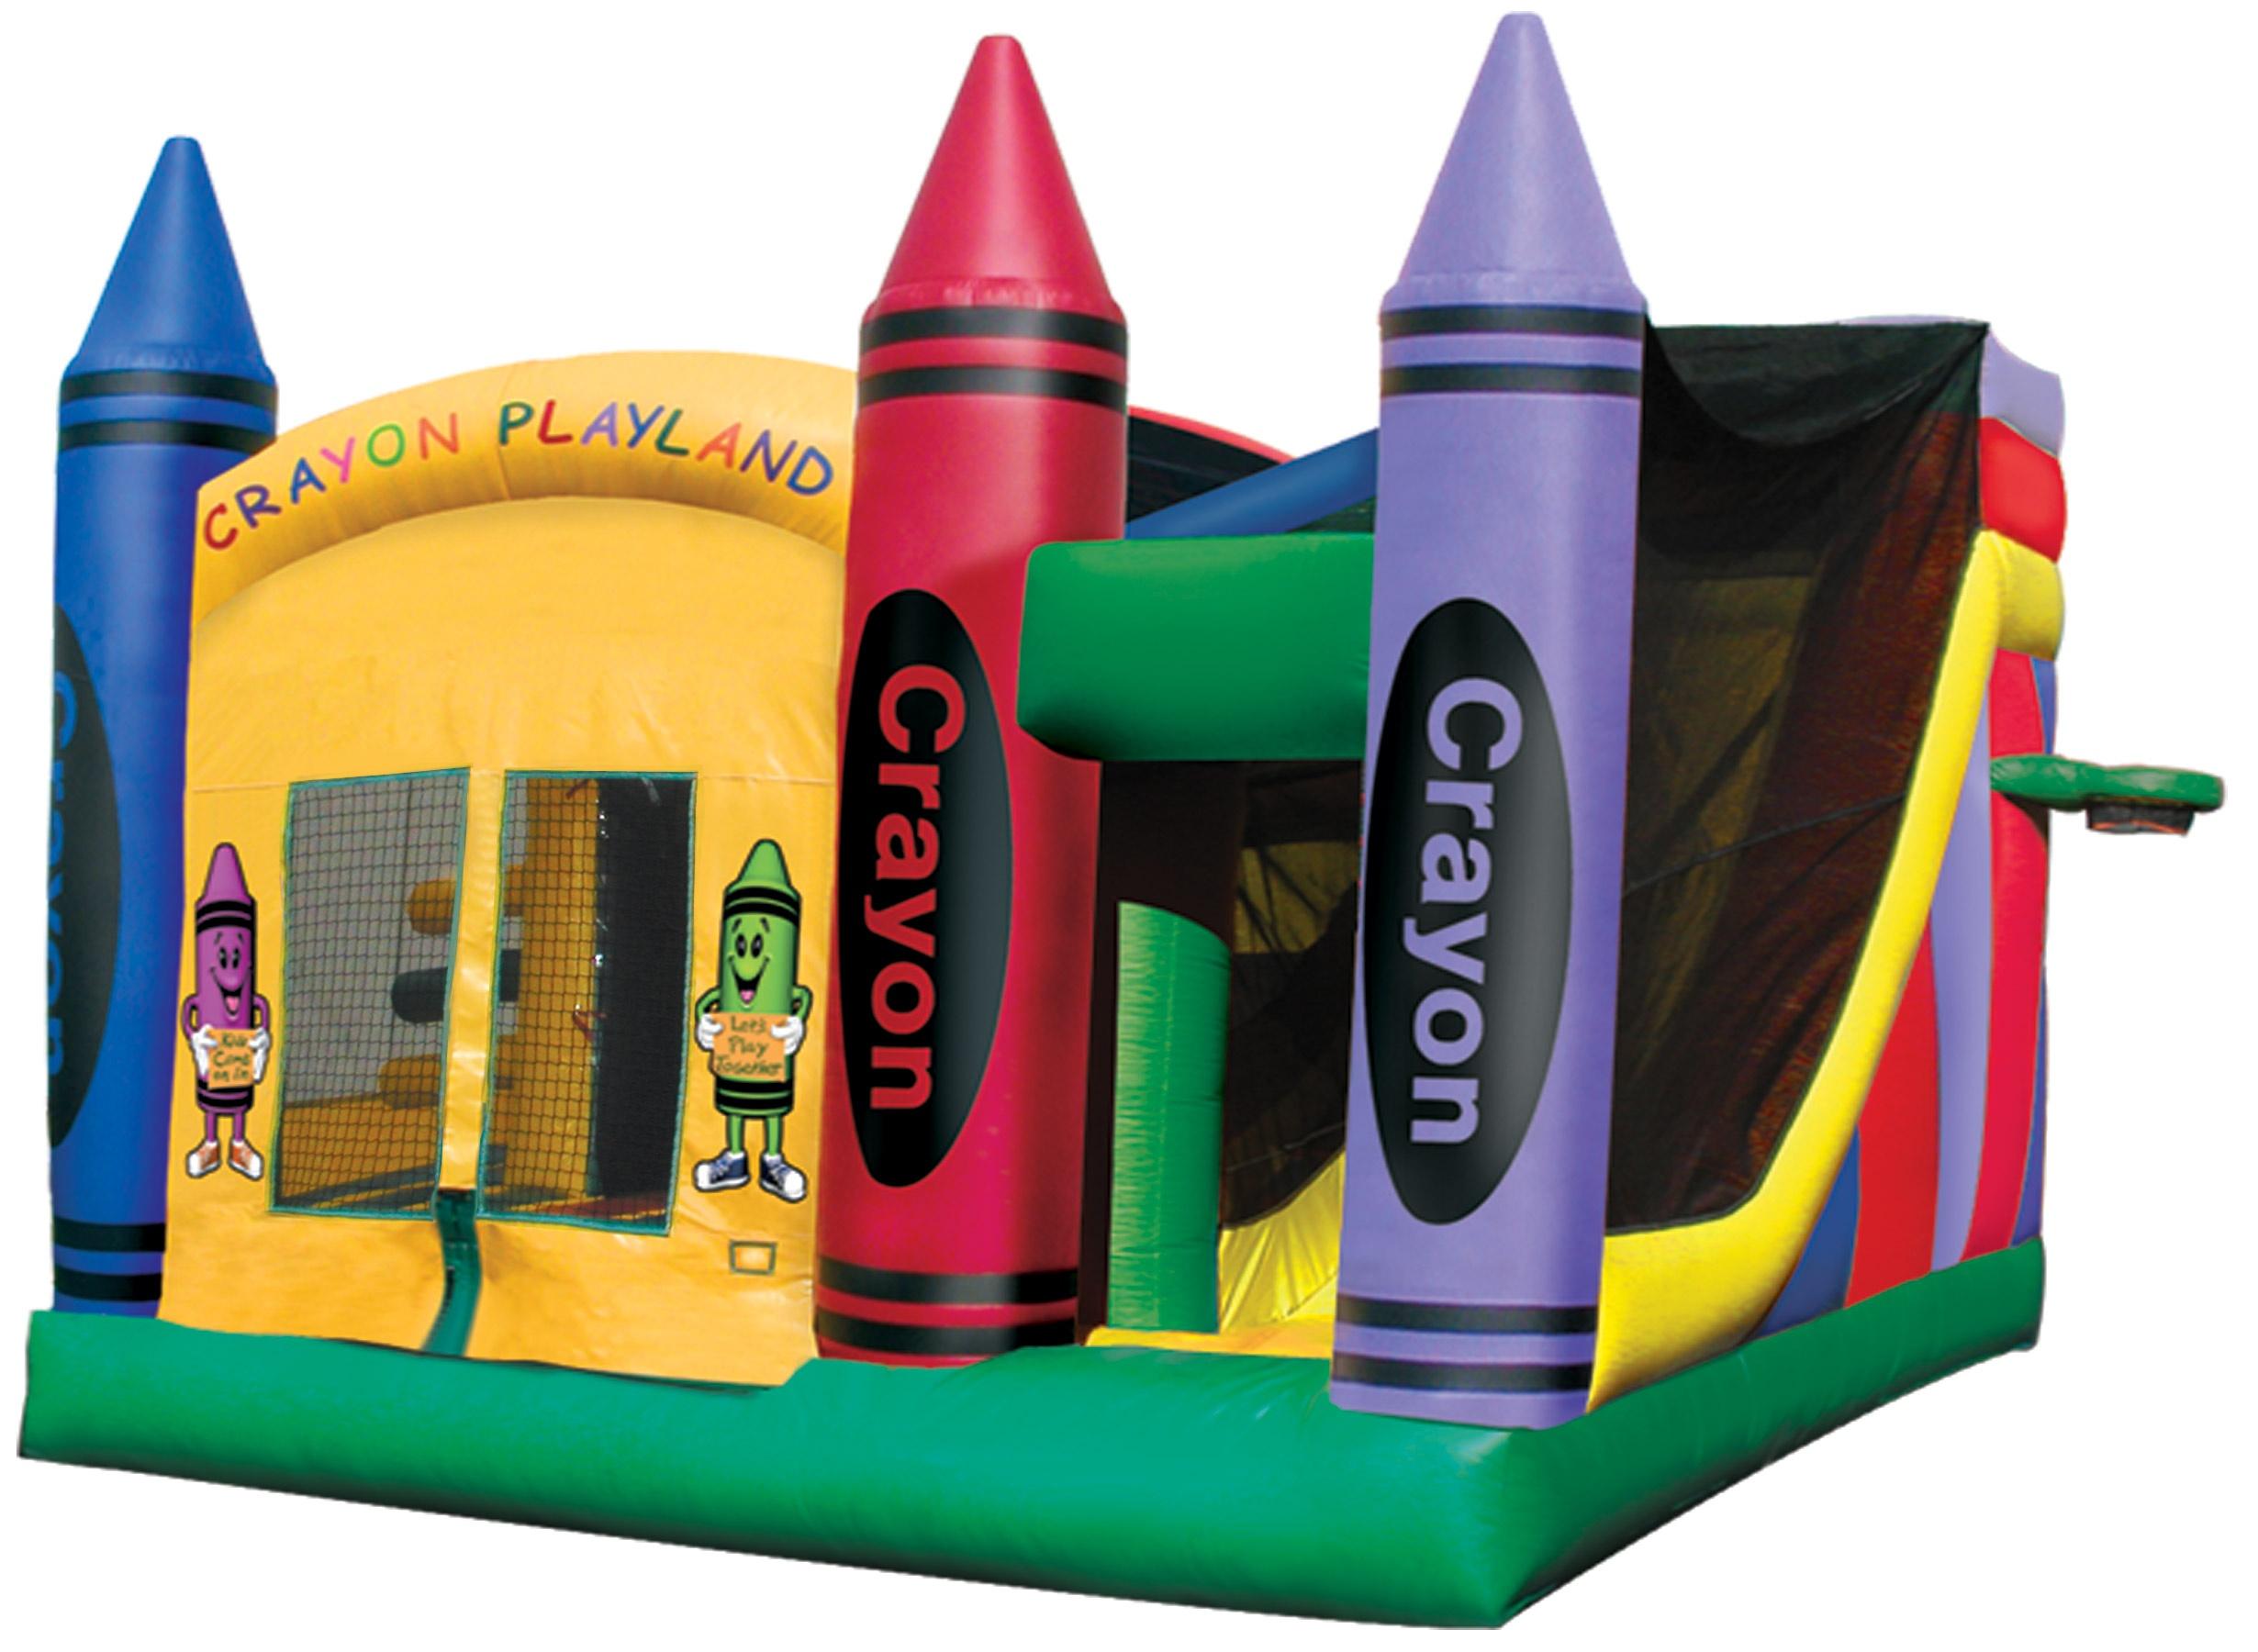 Crayola 5 In 1 Combo Combo Bounce House